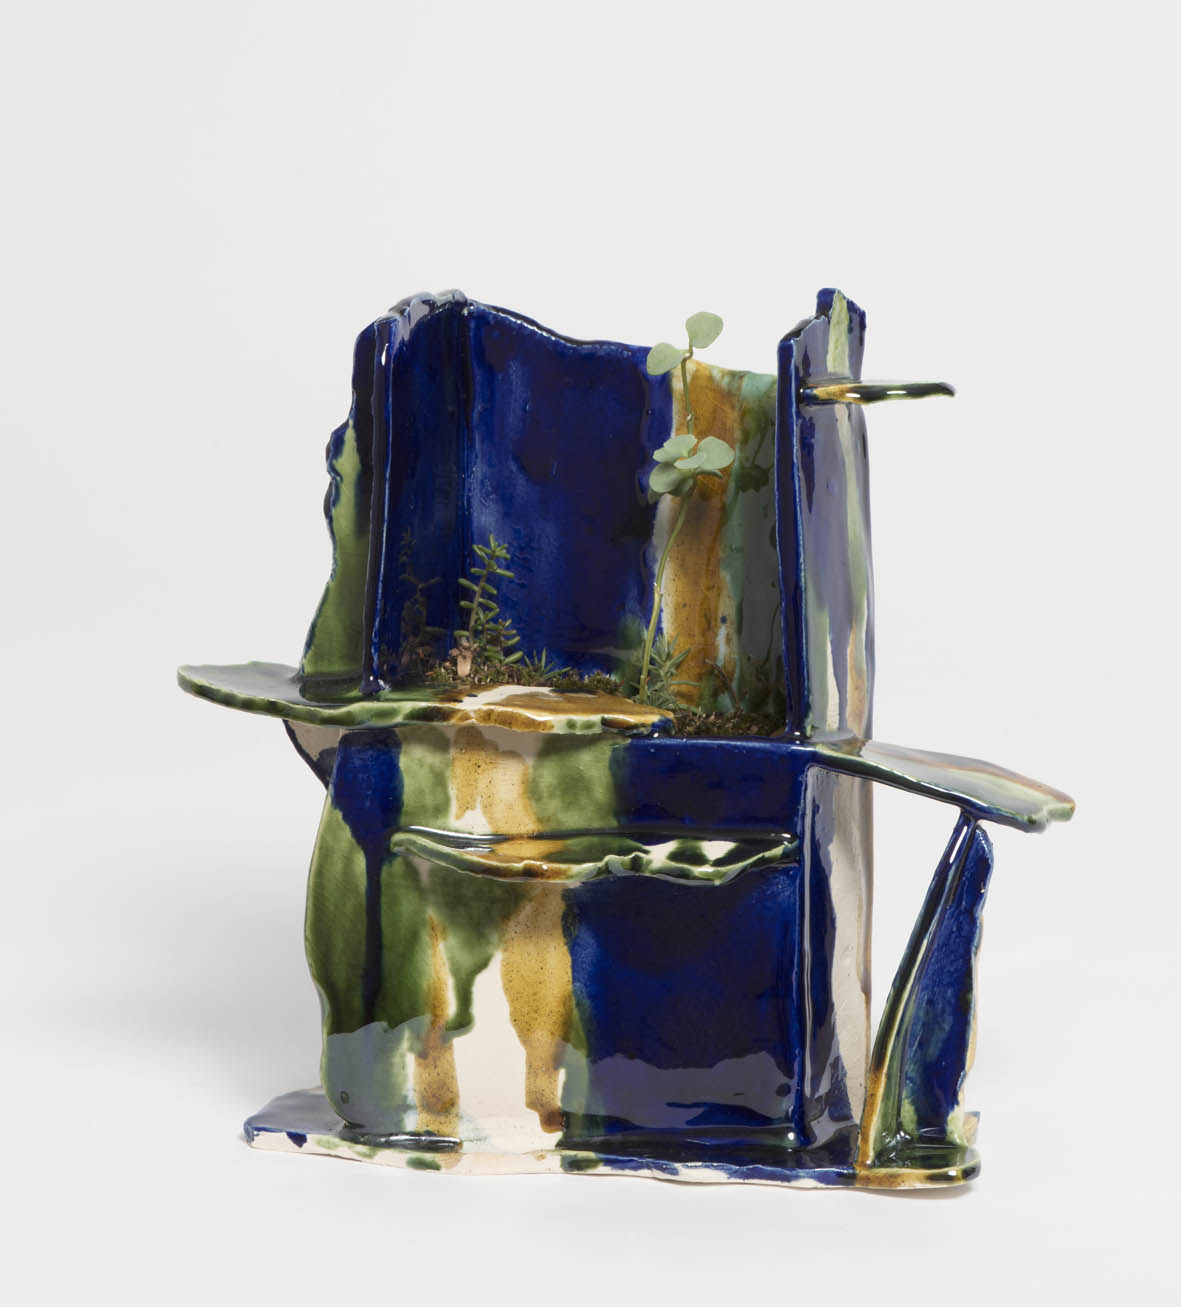 High garden in Cobalt blue, 2016, earthenware, glazed ceramic, 18 x 8 x 21 cm.SOLD